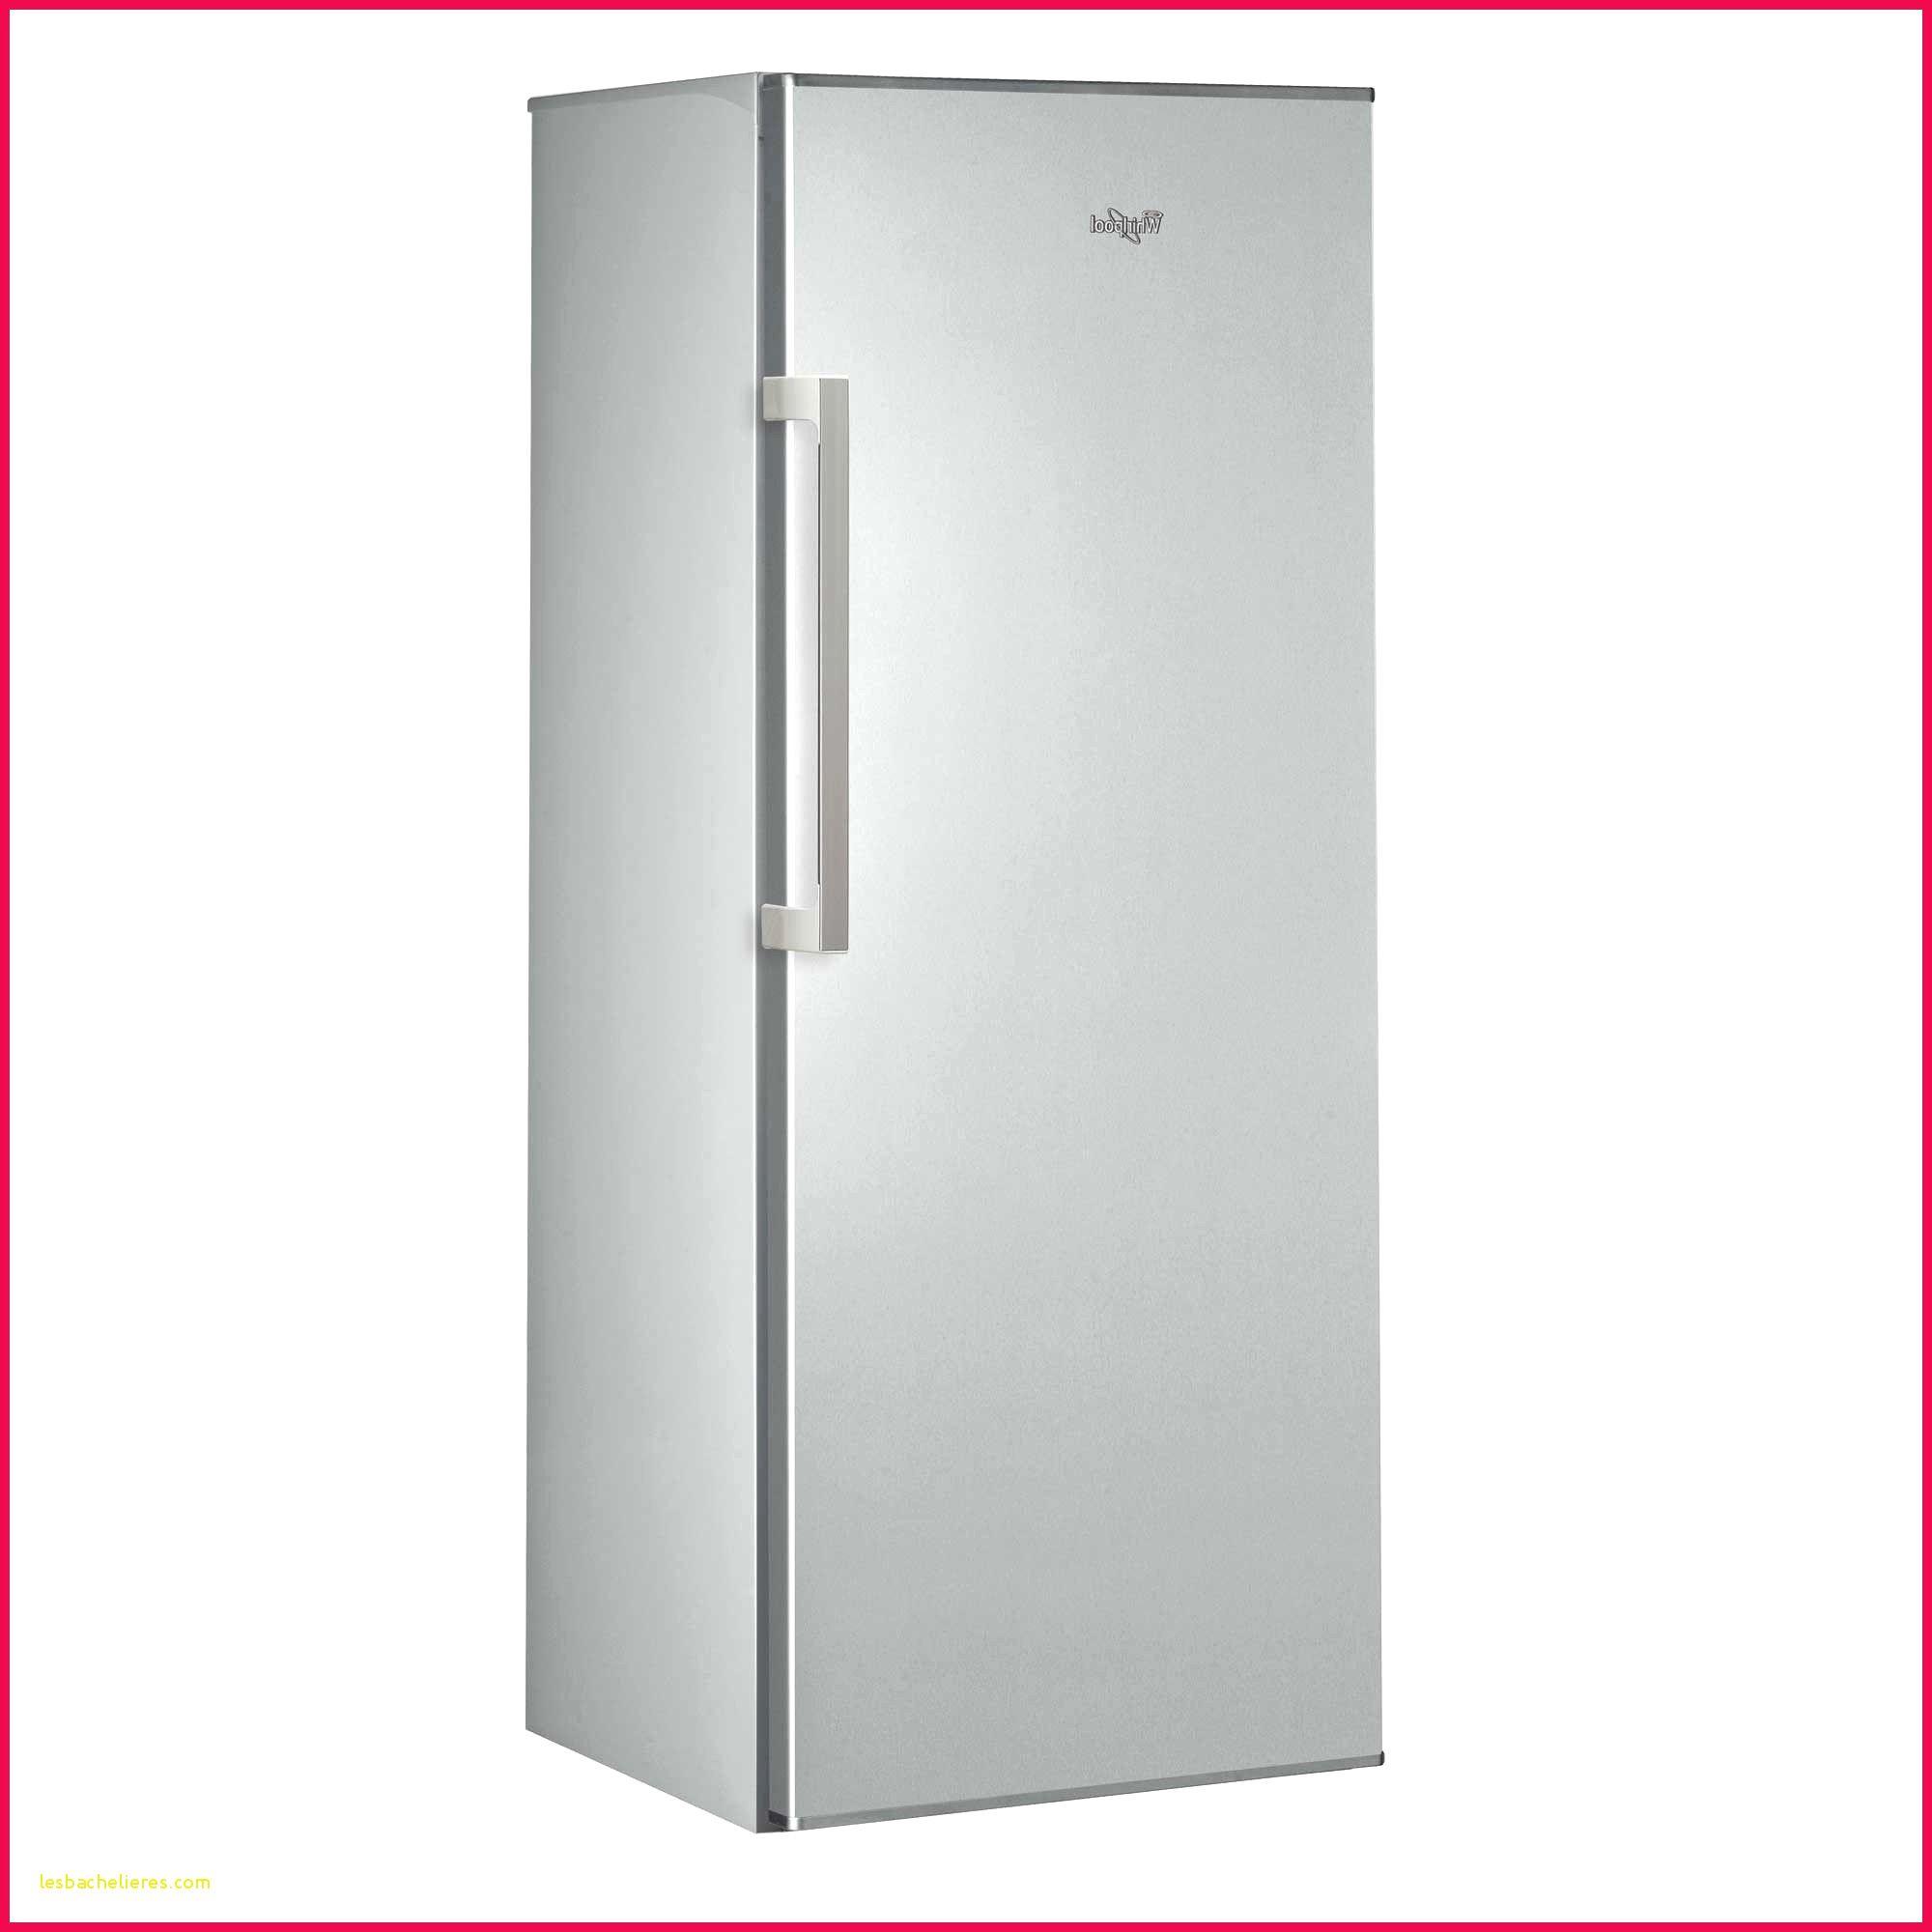 Congelateur Armoire Electro Depot Congelateur Armoire Electro Depot Electro Depot Electromenager Pas Cher Tall Cabinet Storage Locker Storage Storage Cabinet